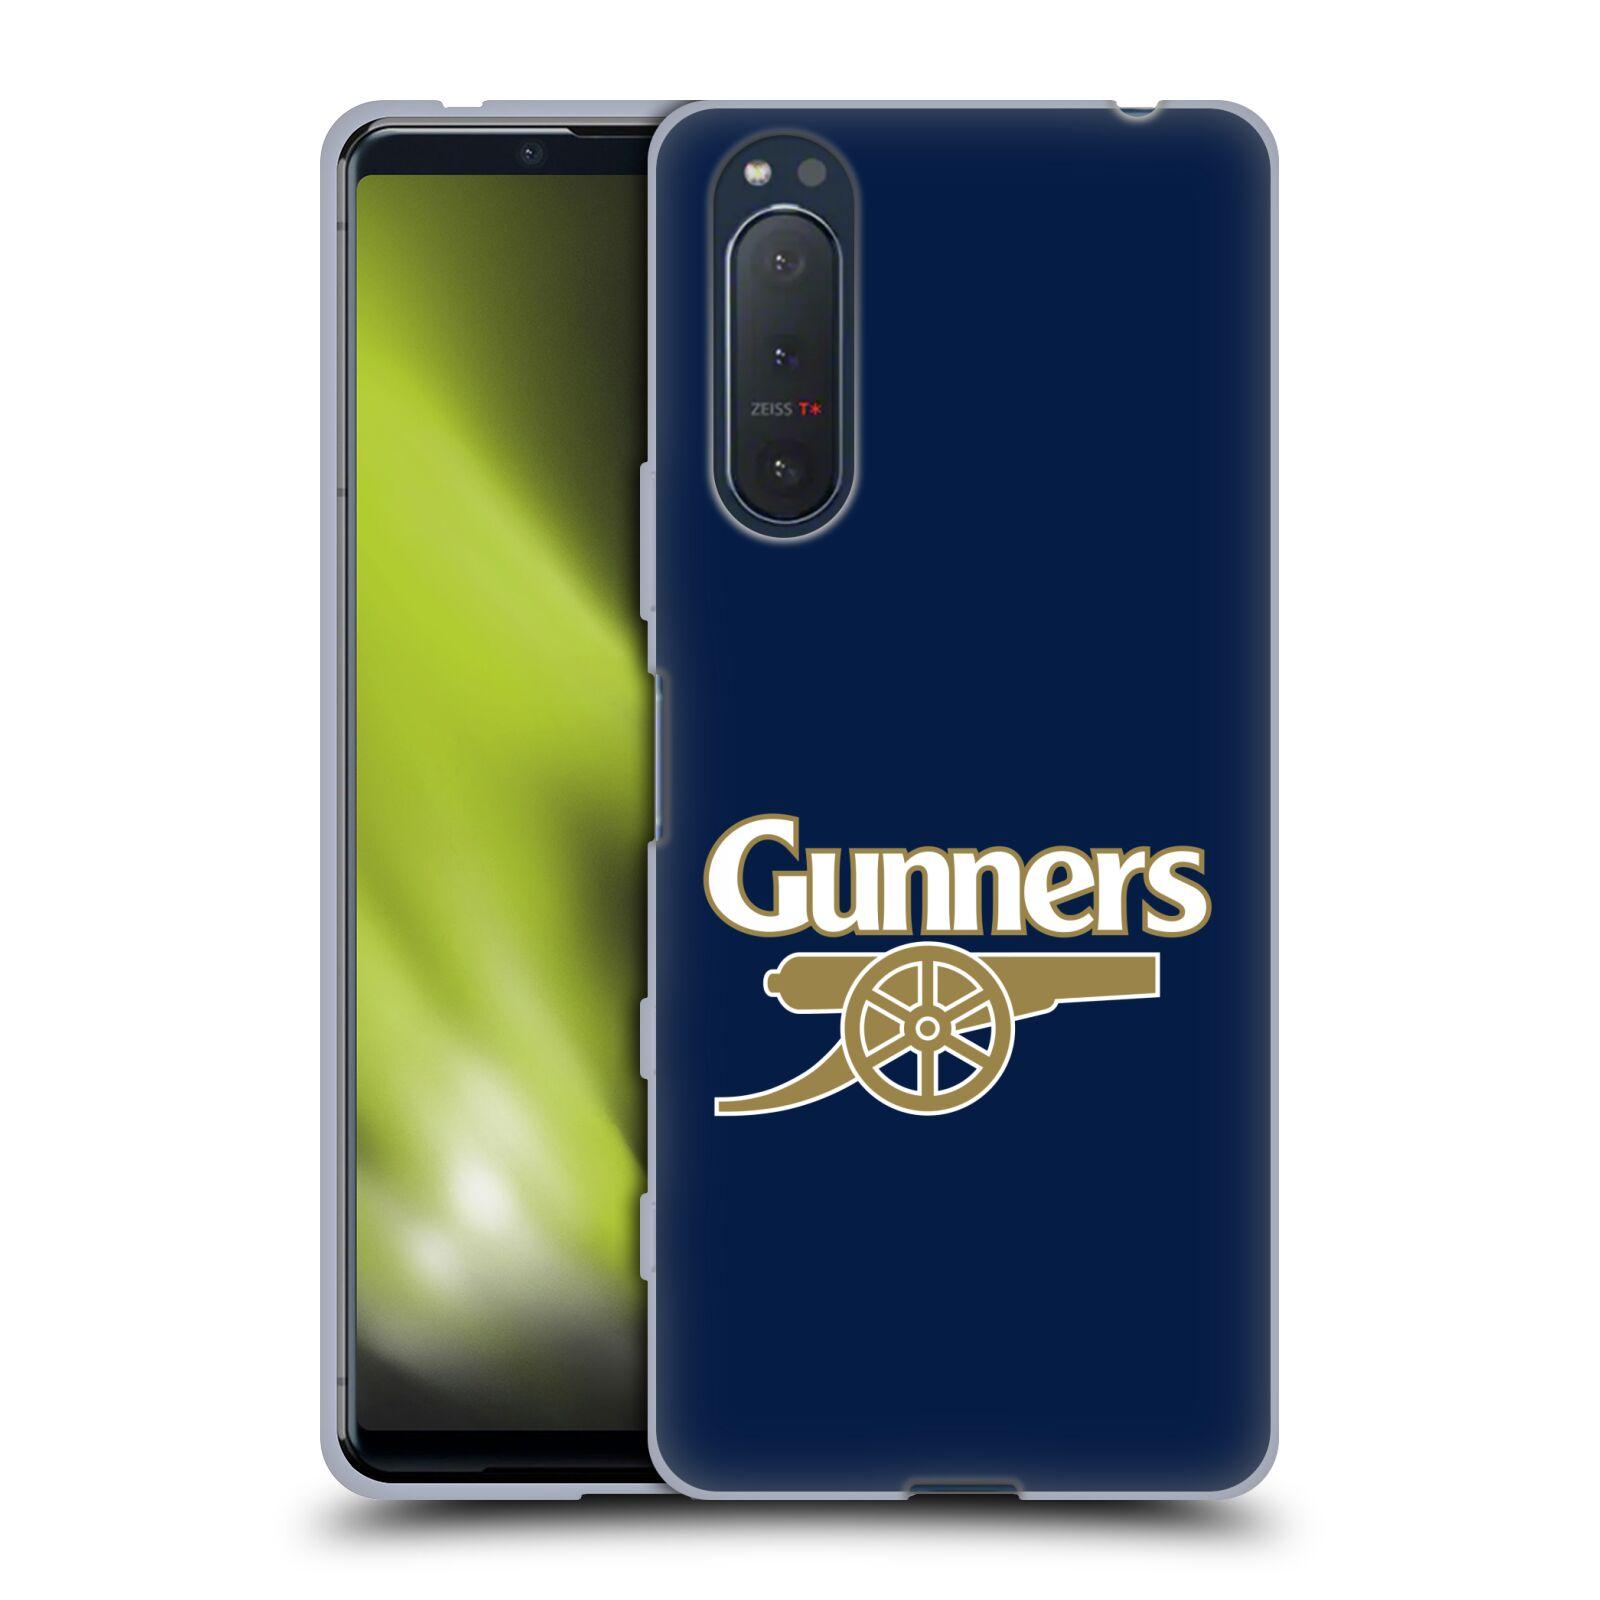 Silikonové pouzdro na mobil Sony Xperia 5 II - Head Case - Arsenal FC - Gunners